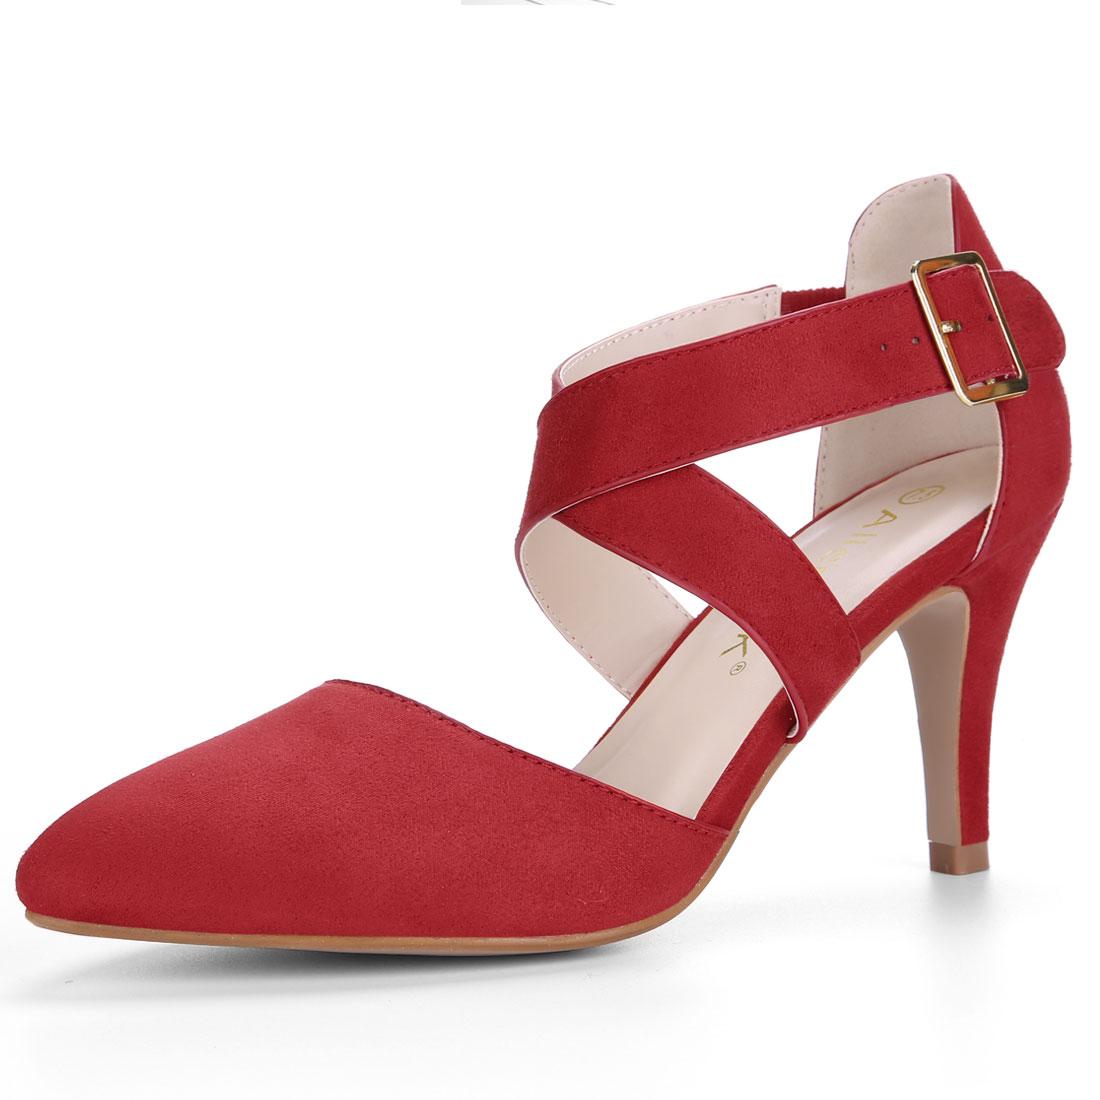 Allegra K Women's Crisscross Straps Stiletto Heel Ankle Strap Pumps Red US 7.5